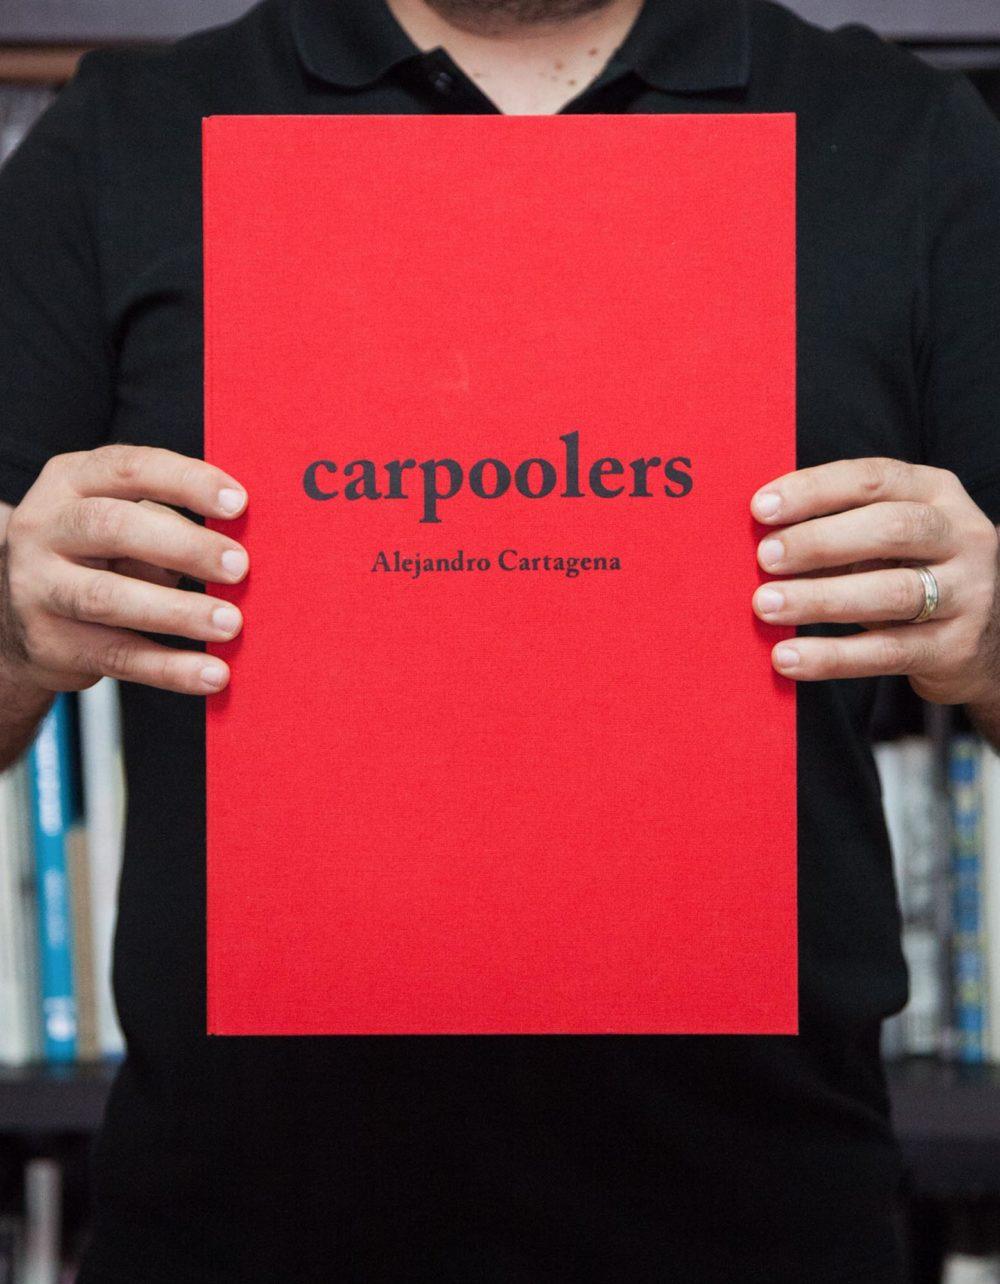 Carpoolers Special edition book by Alejandro Cartagena 1st edition